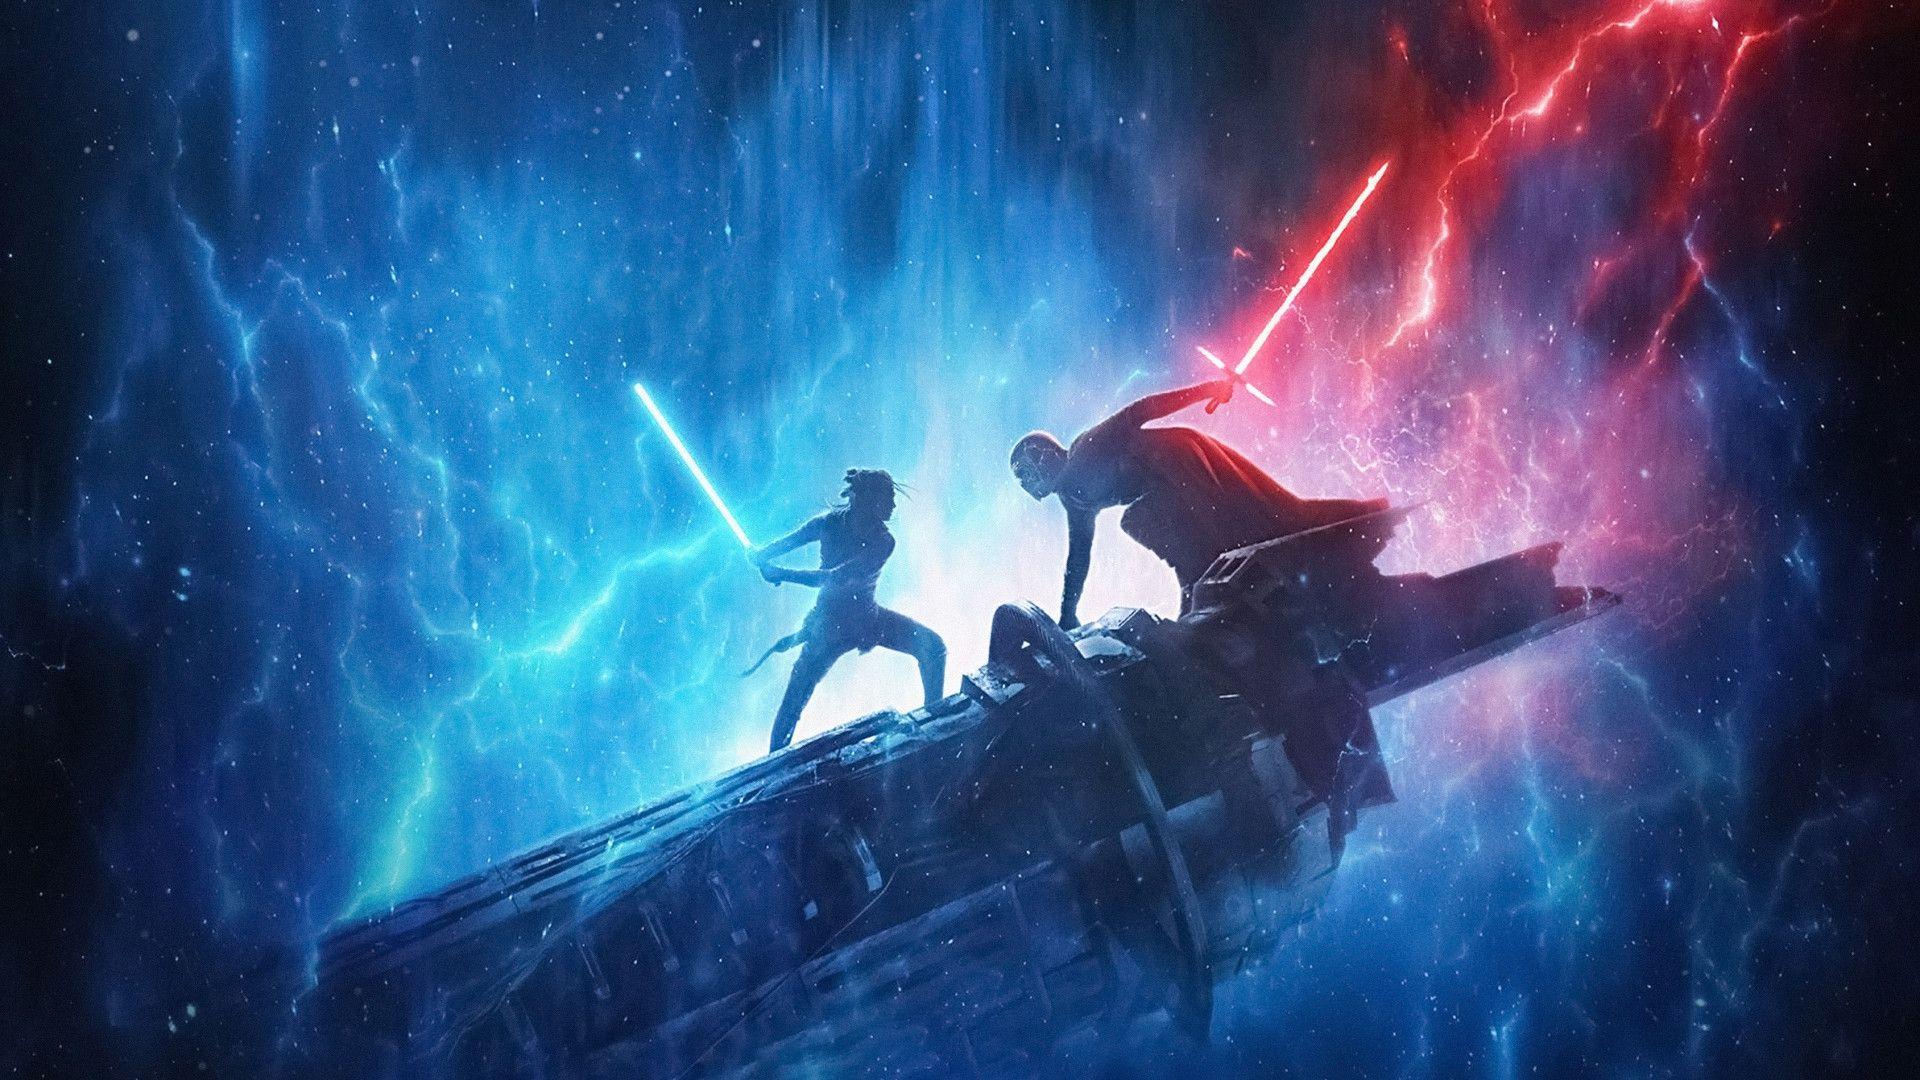 Star Wars Full Hd Wallpapers Top Free Star Wars Full Hd Backgrounds Wallpaperaccess